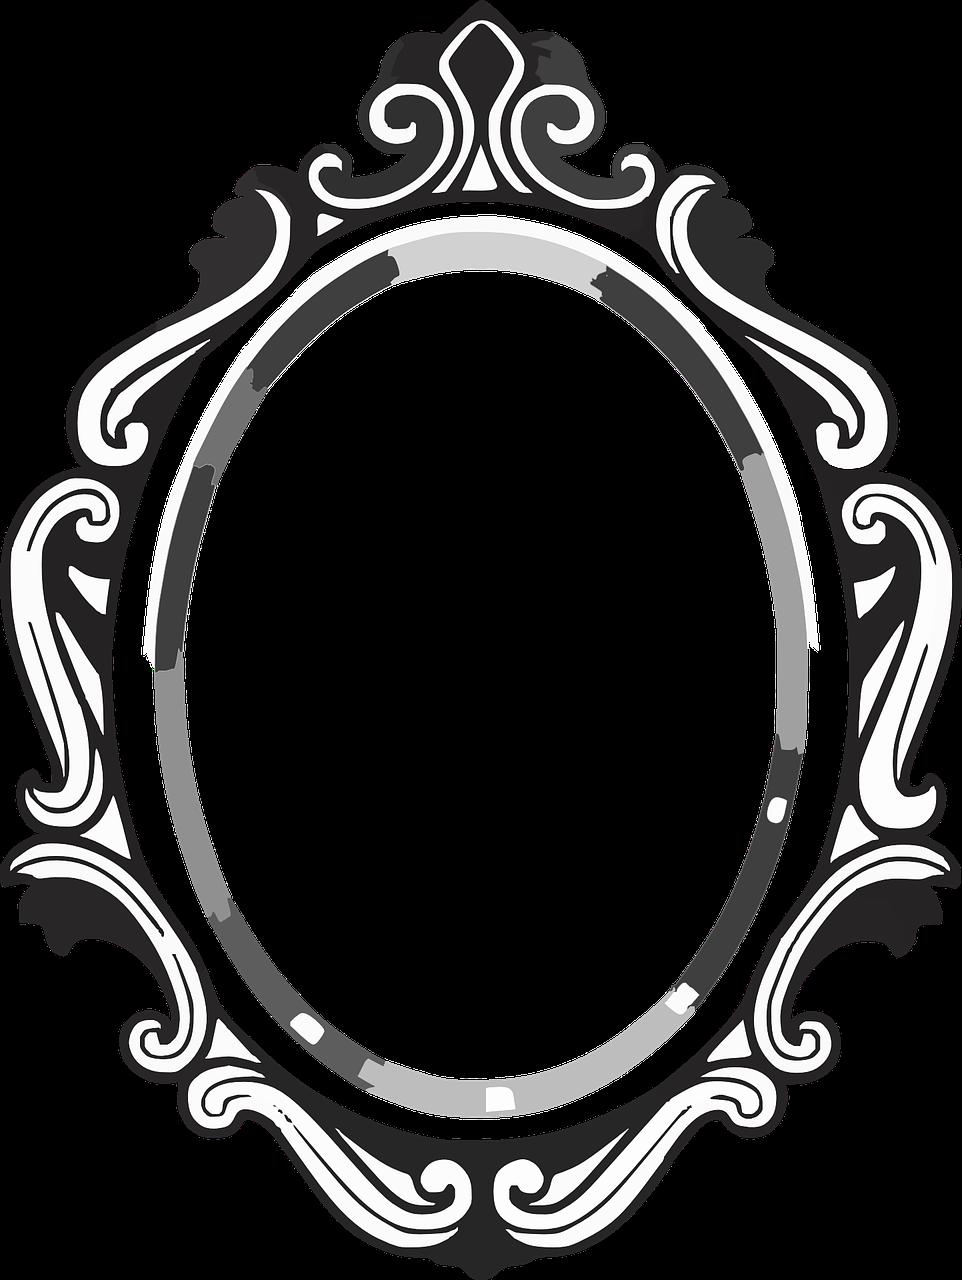 вектор картинки для зеркал